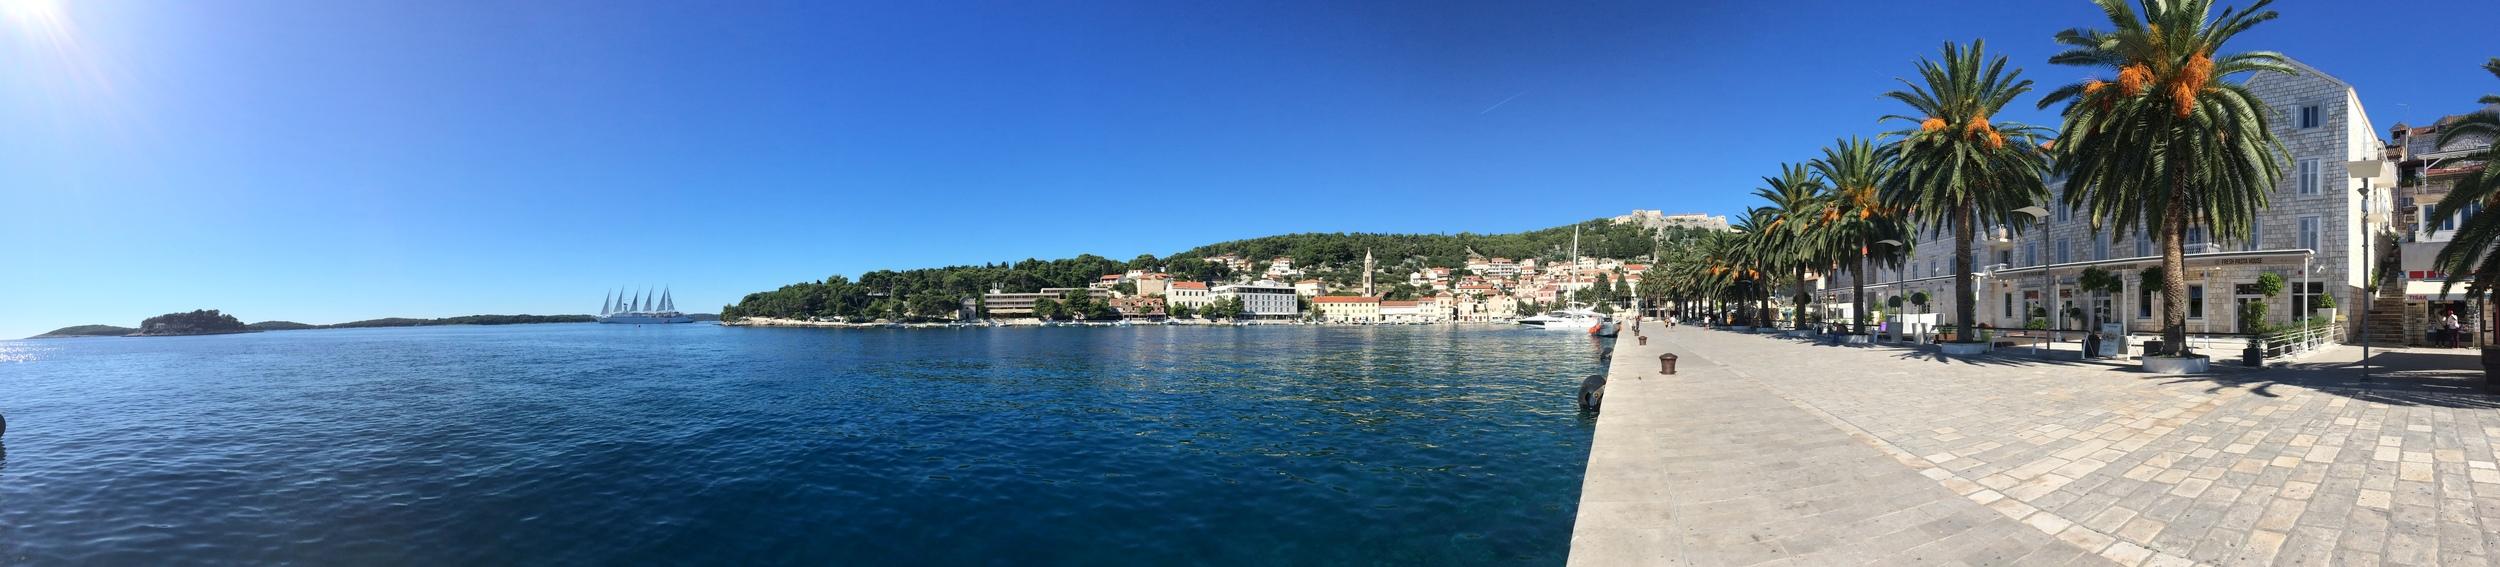 Panoramic shot of Hvar port in the city center.